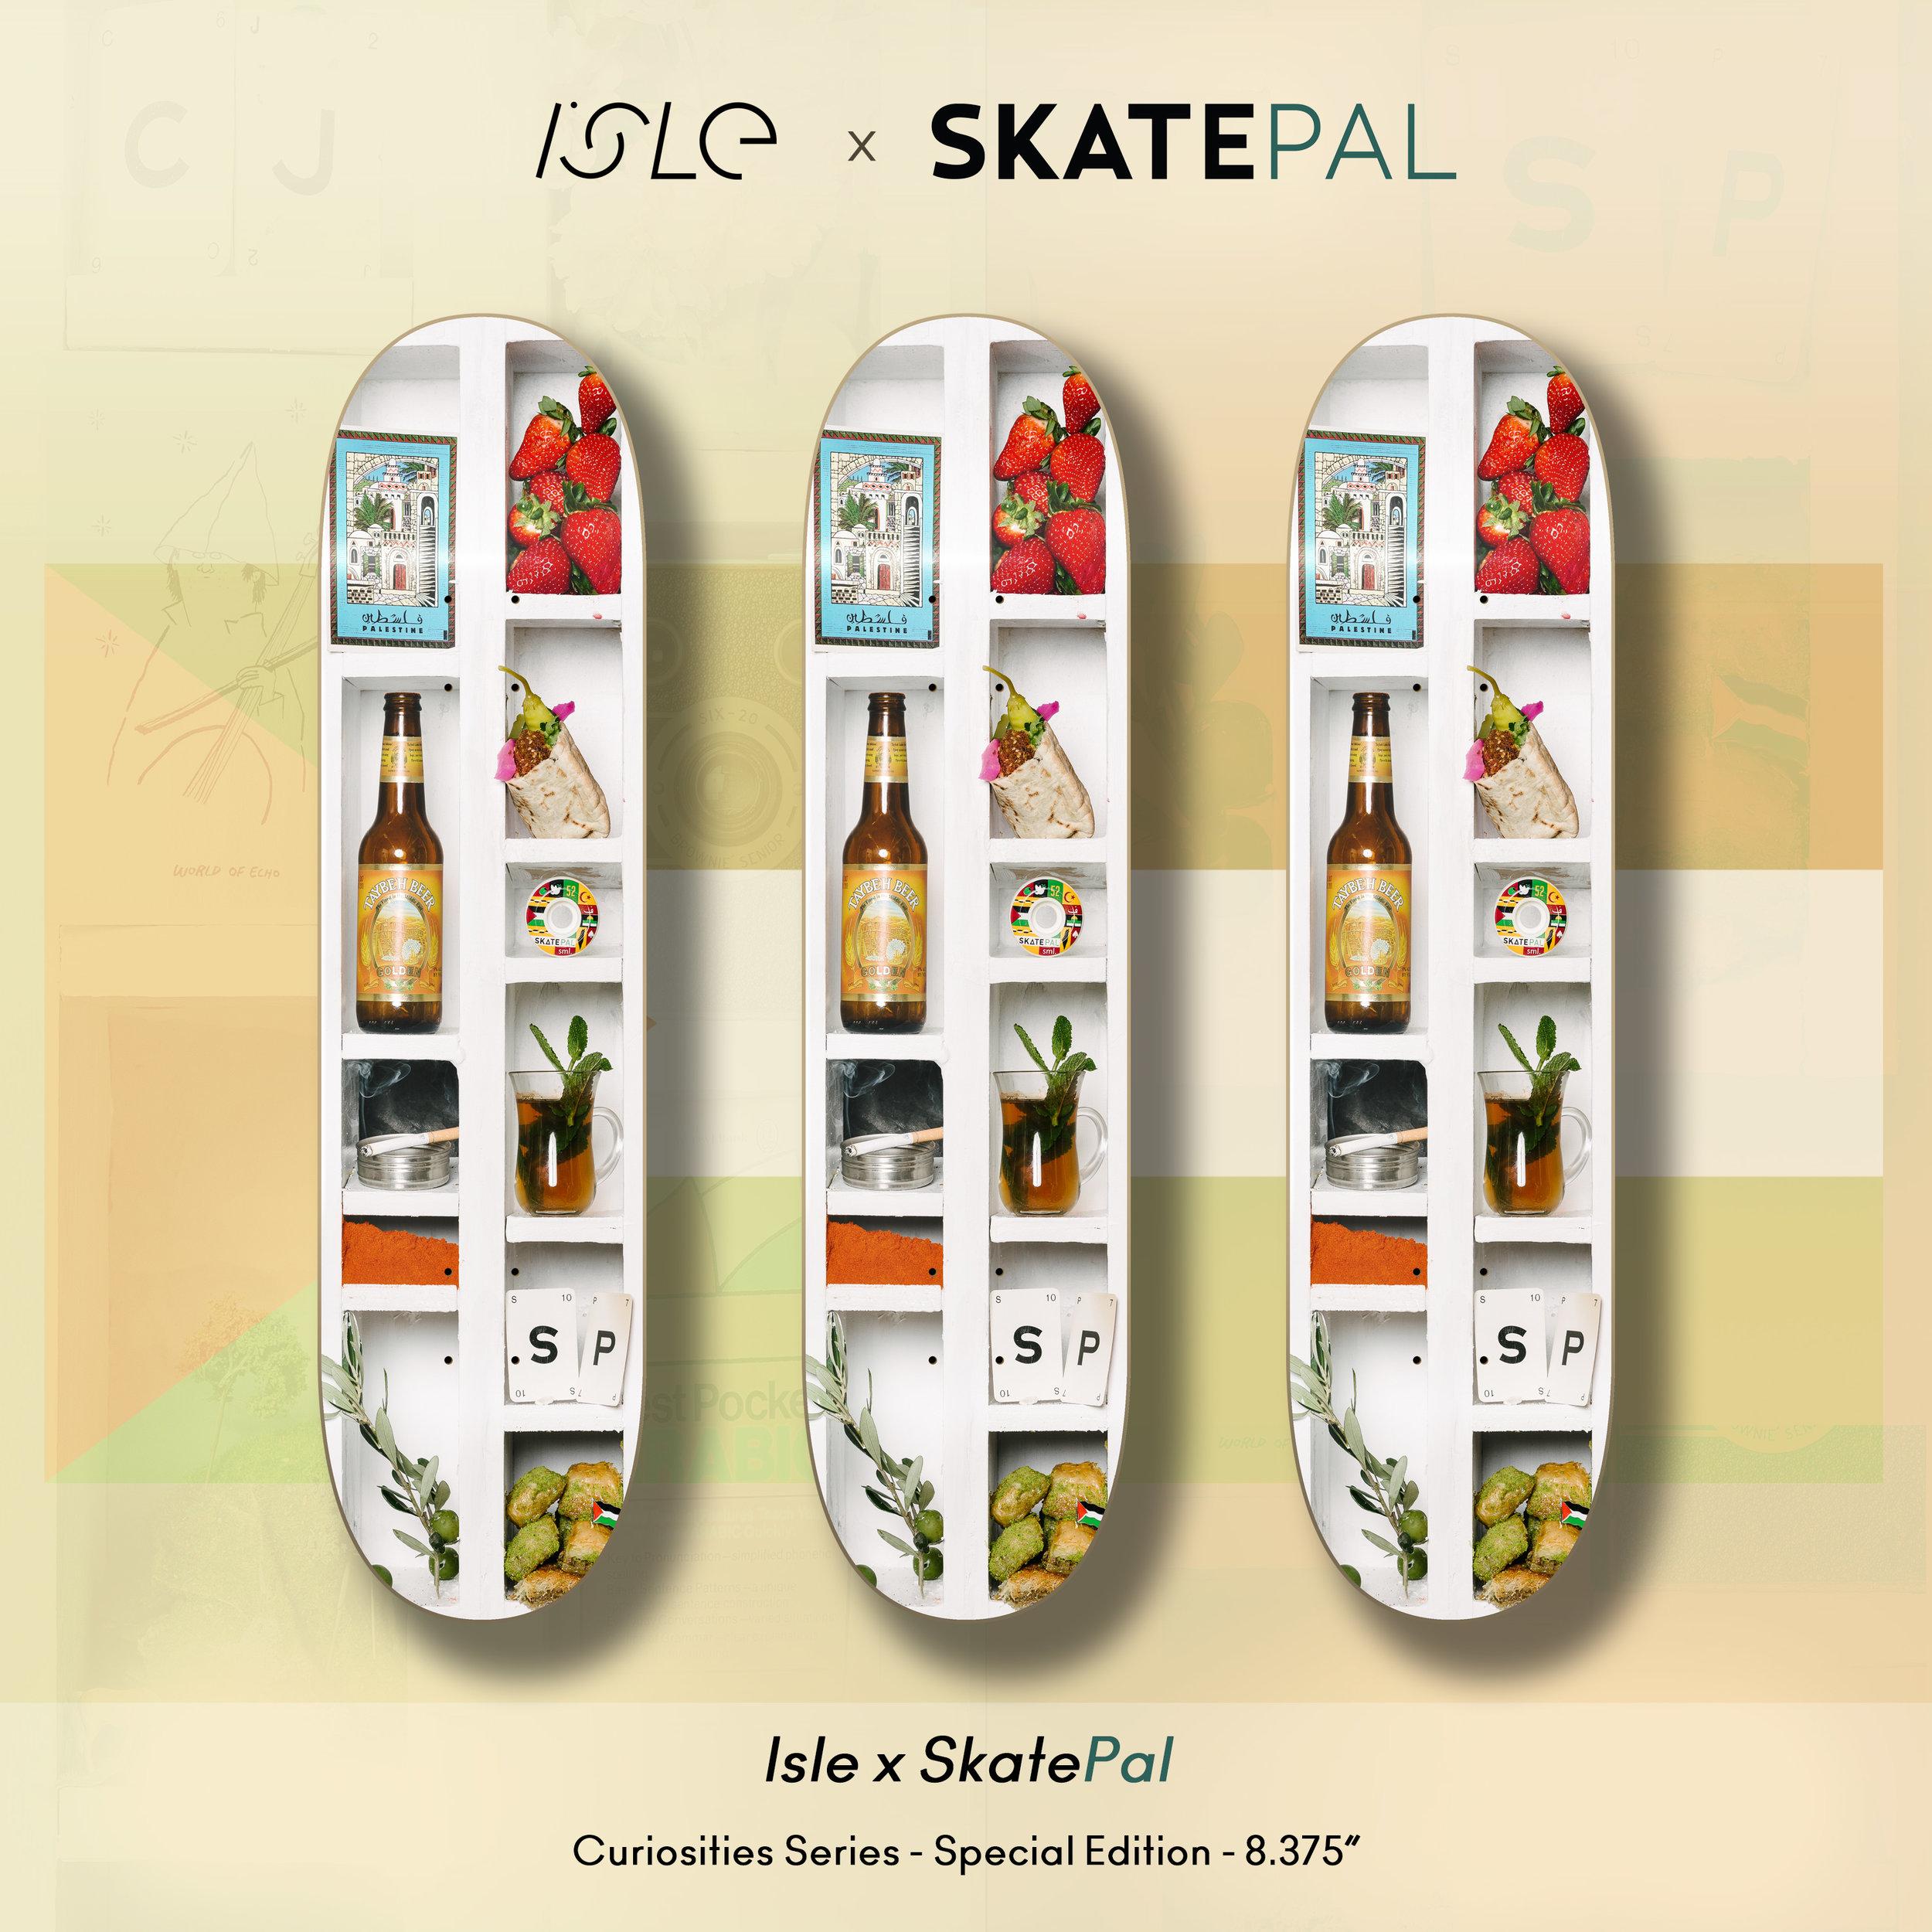 Isle x SkatePal - Curiosities Series - special edition.jpg